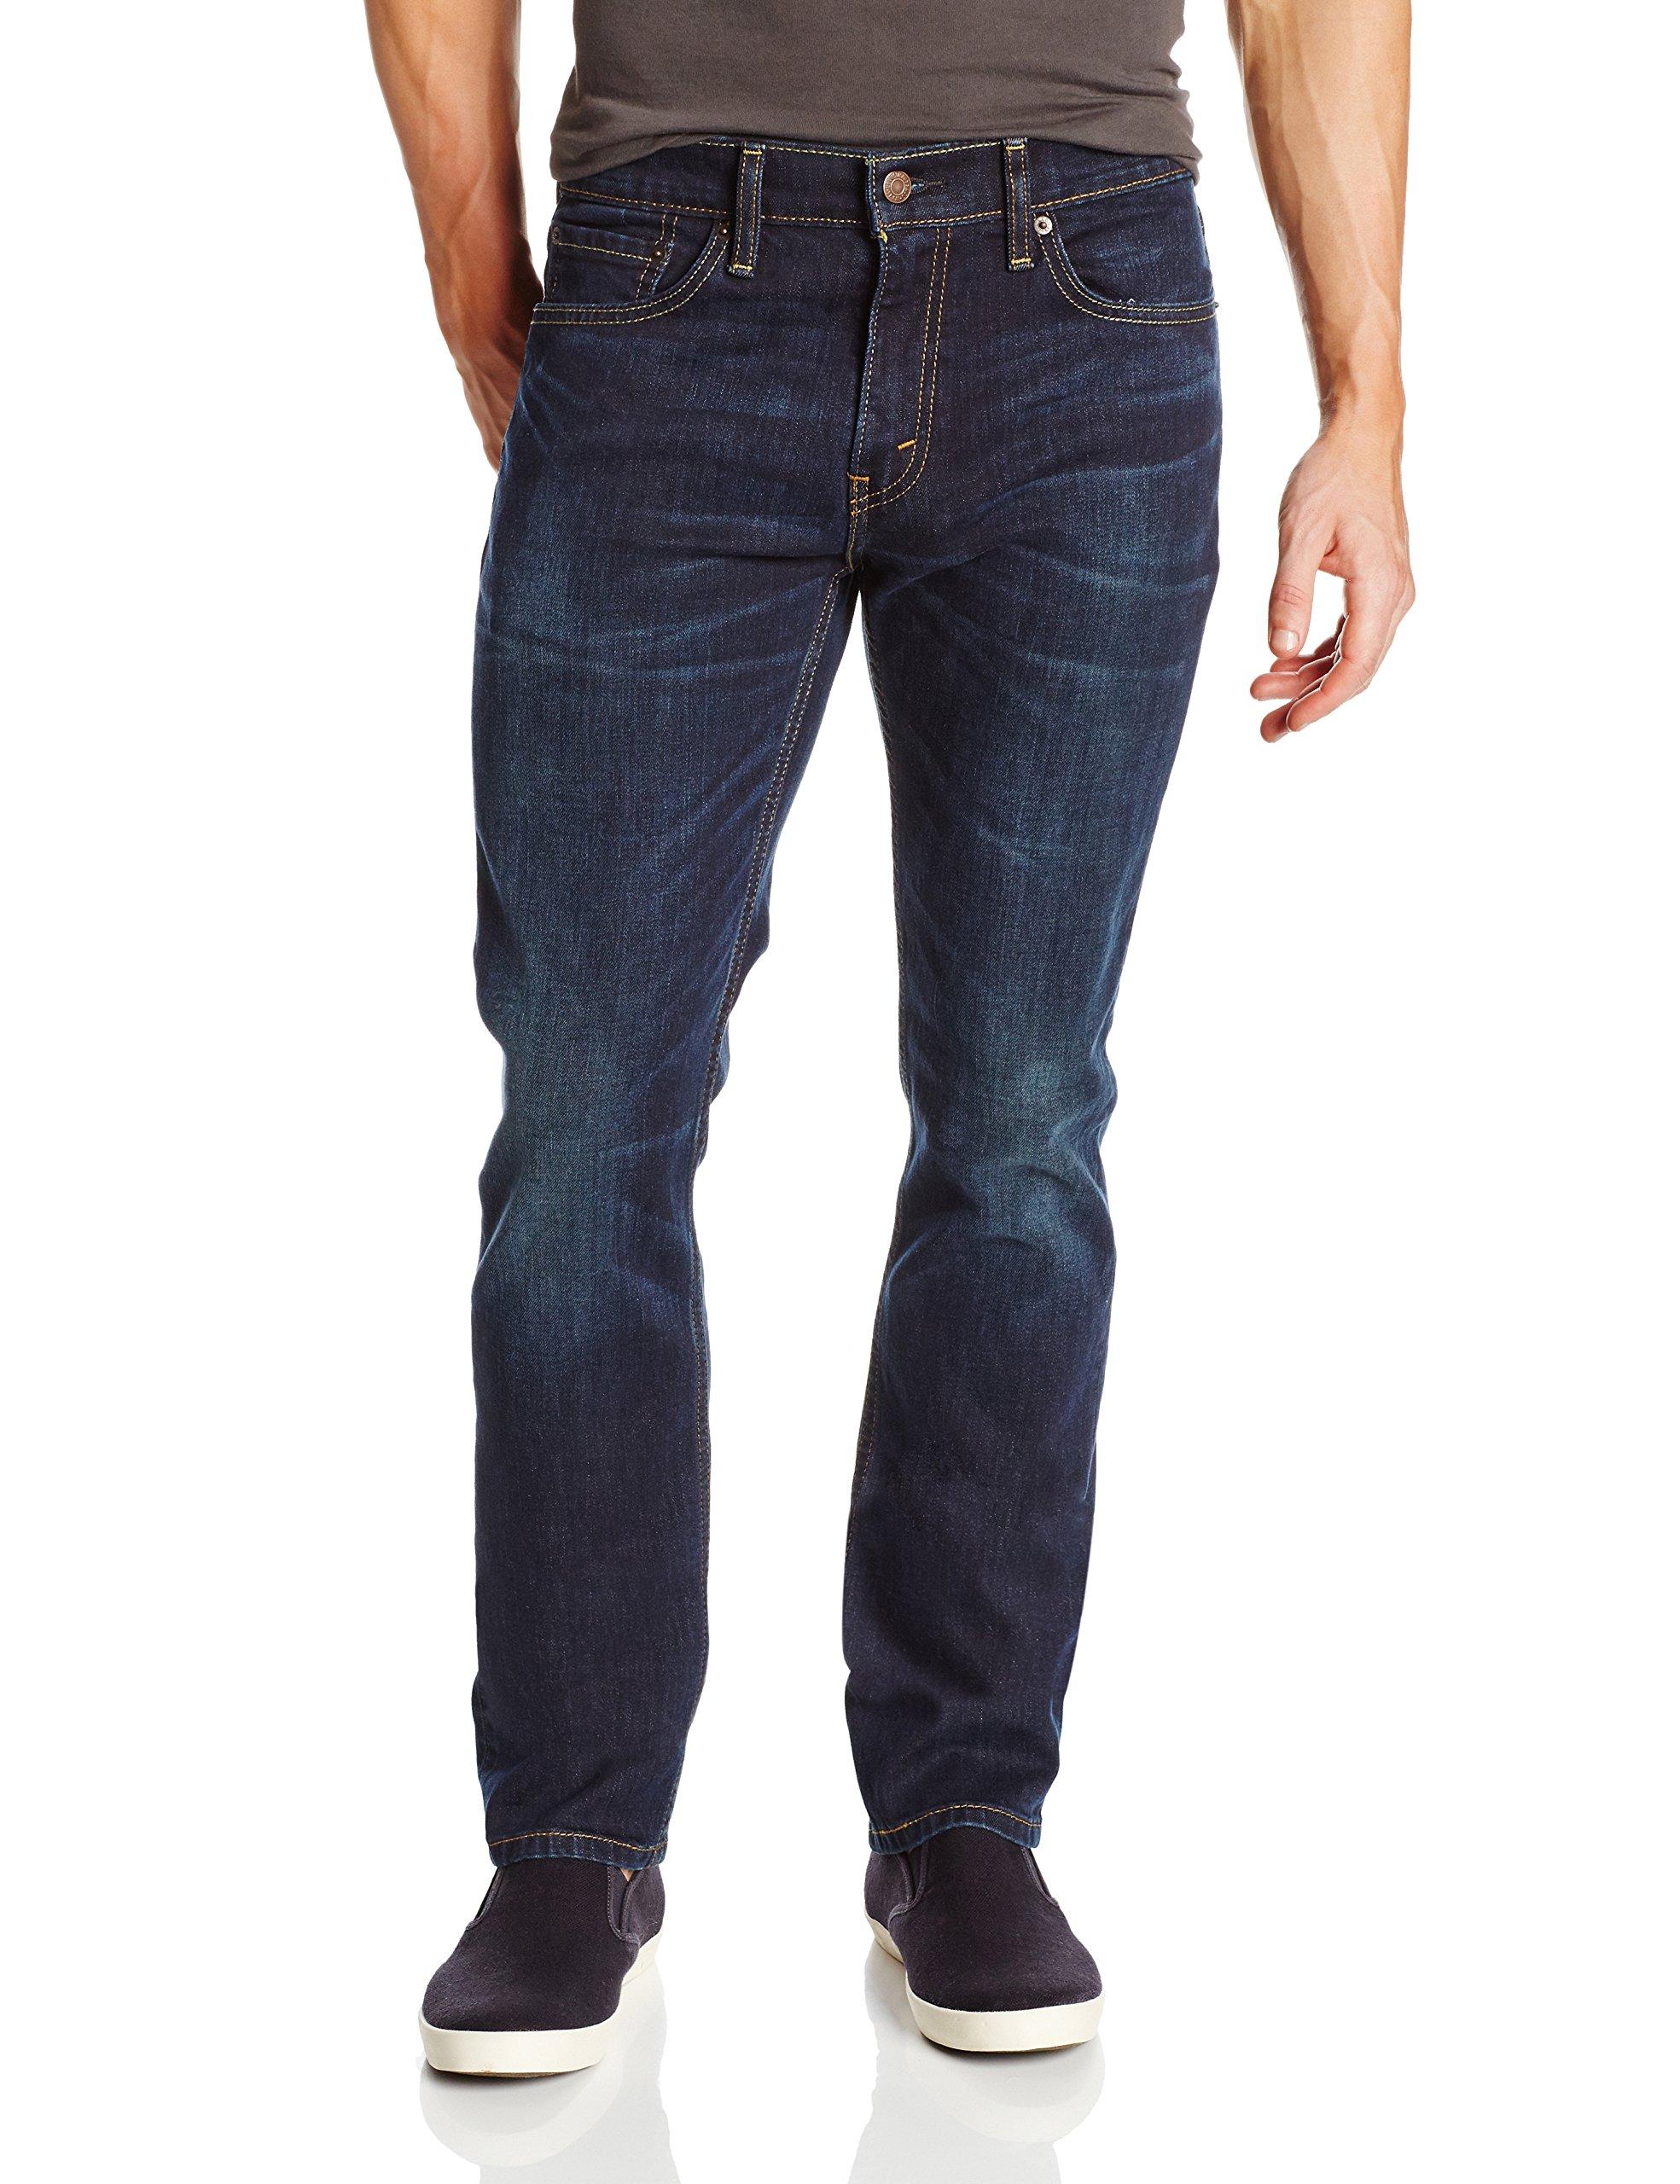 Levi's Men's 511 Slim Fit Jean, Sequoia - Stretch, 32W x 36L